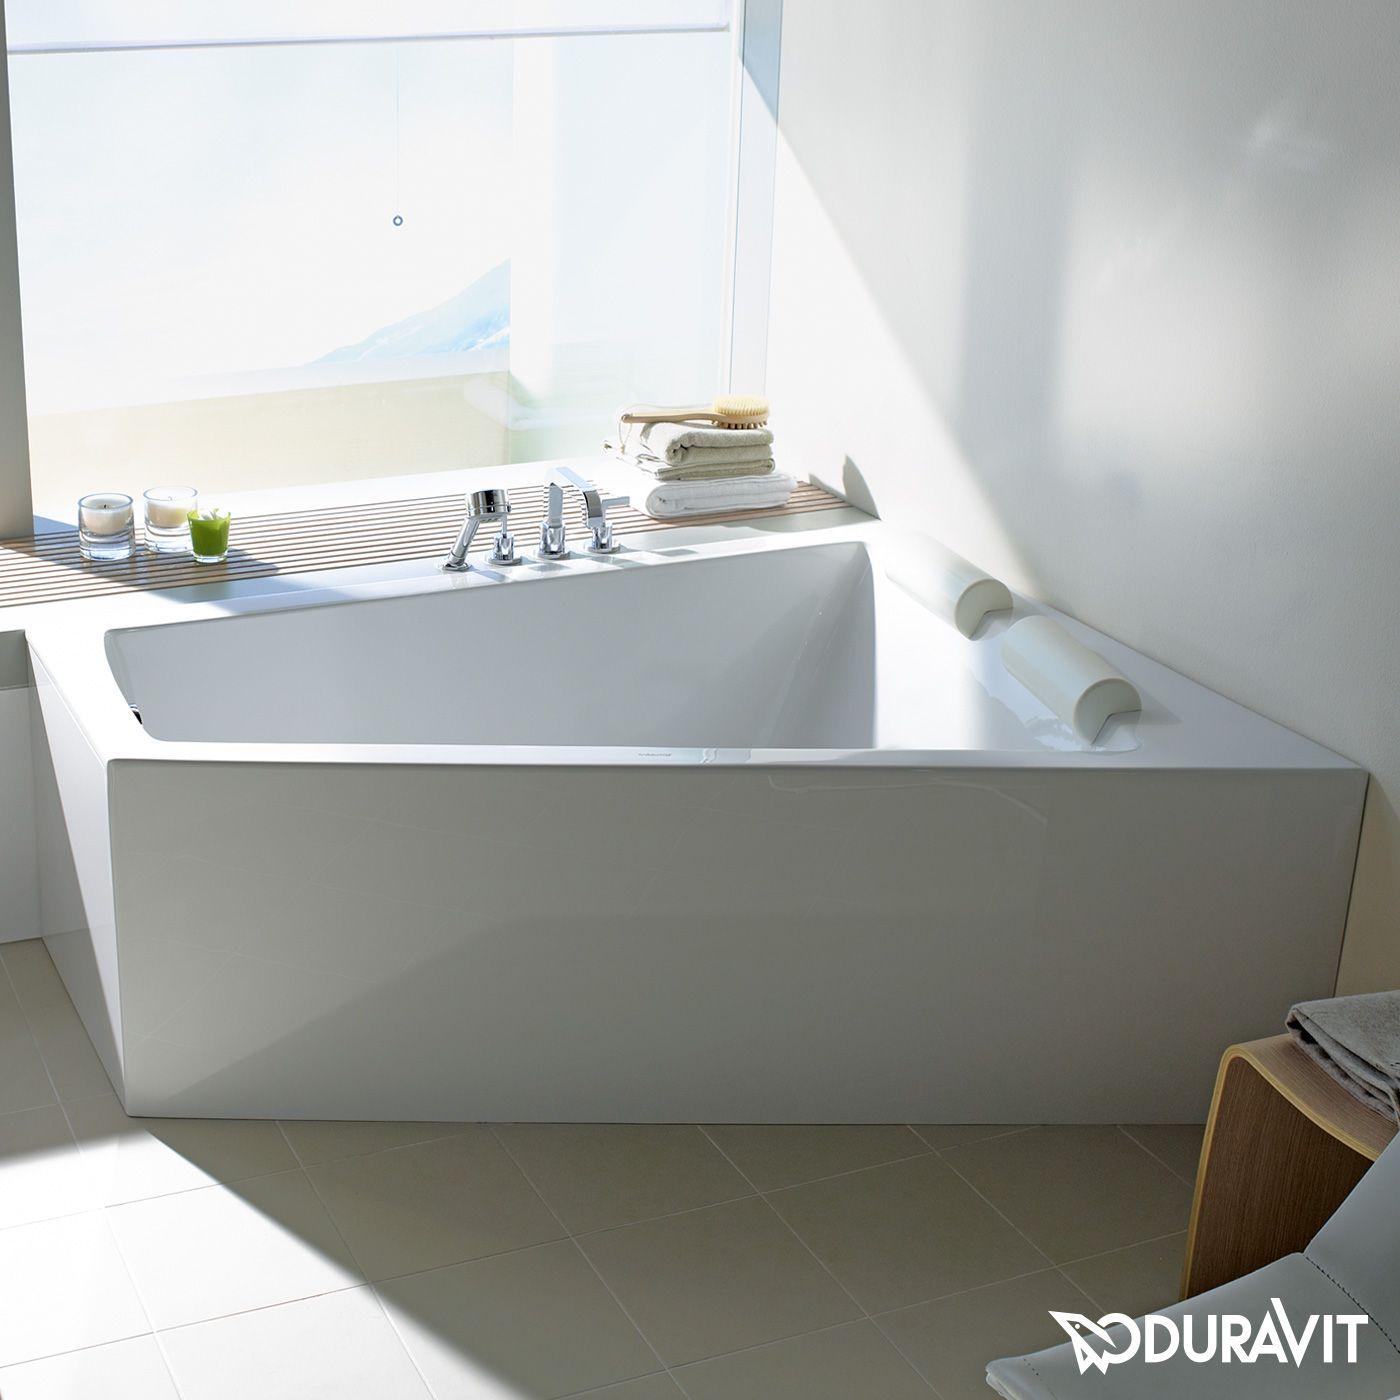 duravit paiova vasca  le vasche  pinterest  duravit bathtubs  - duravit paiova vasca